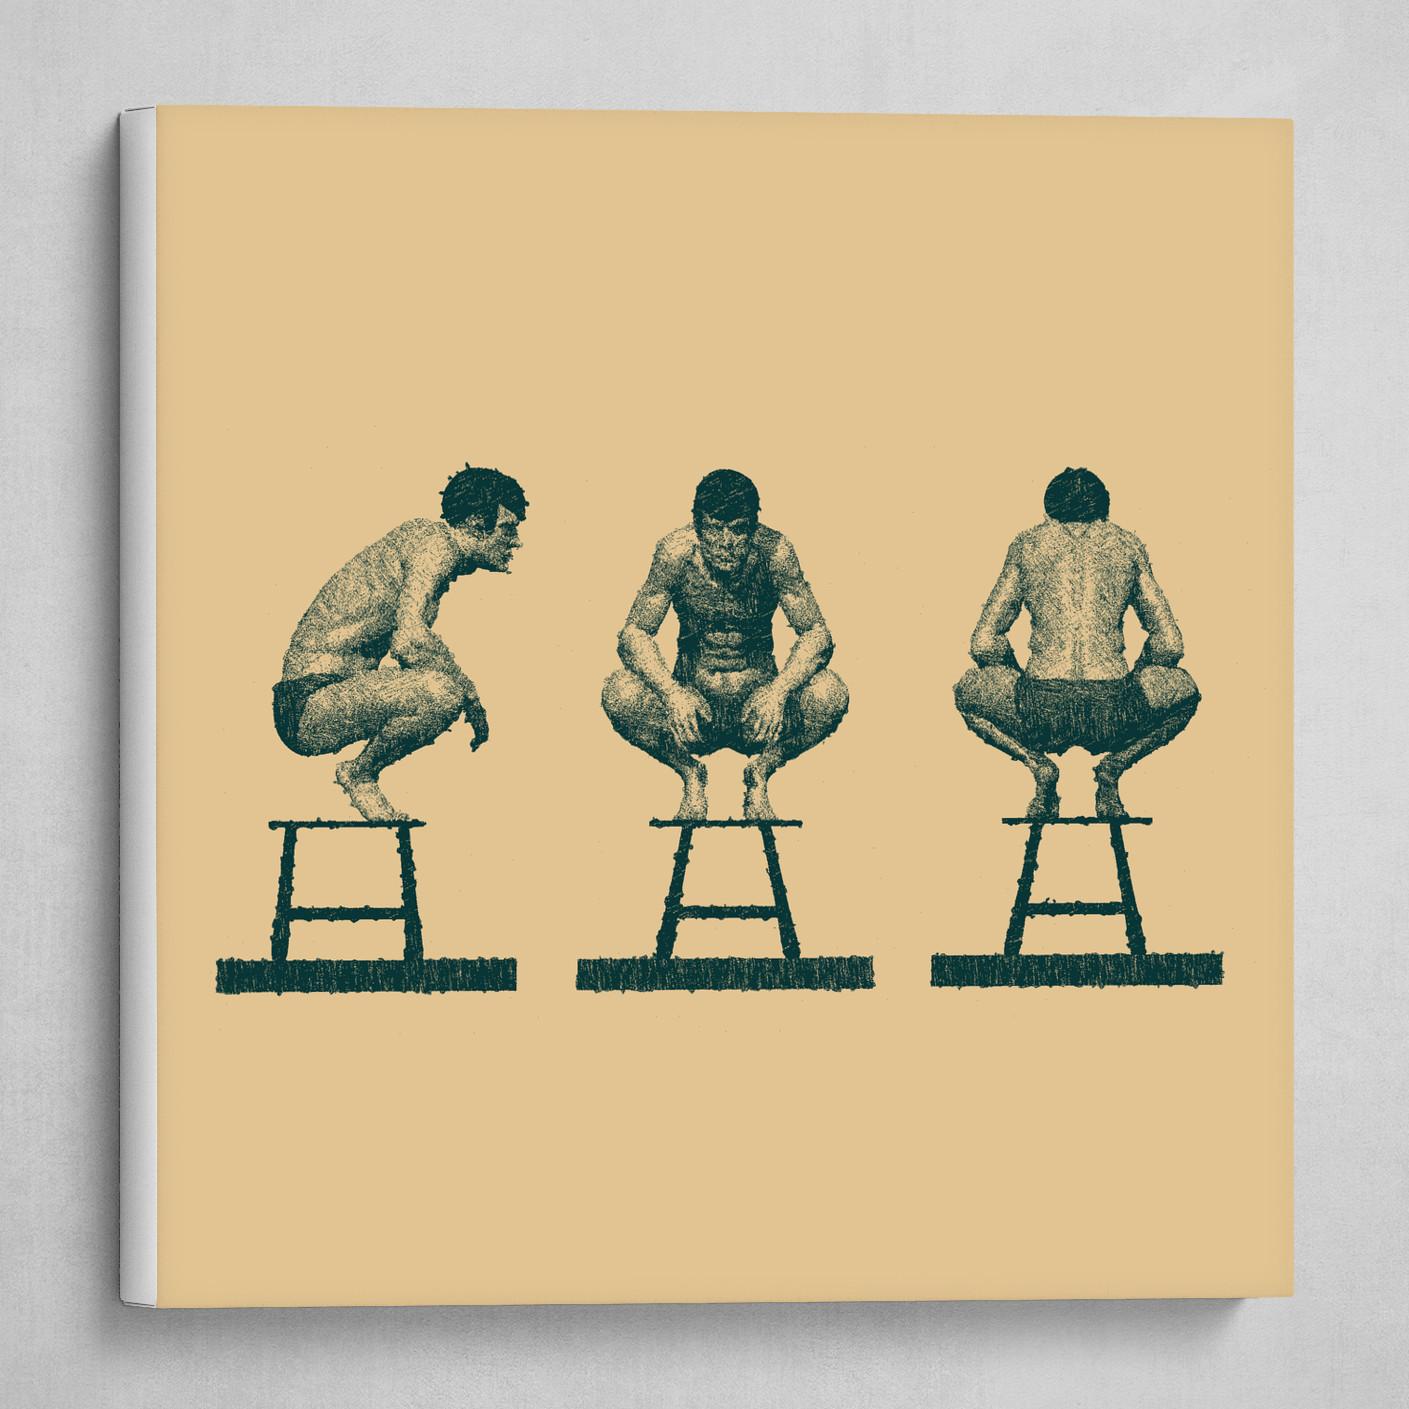 3 man crouching